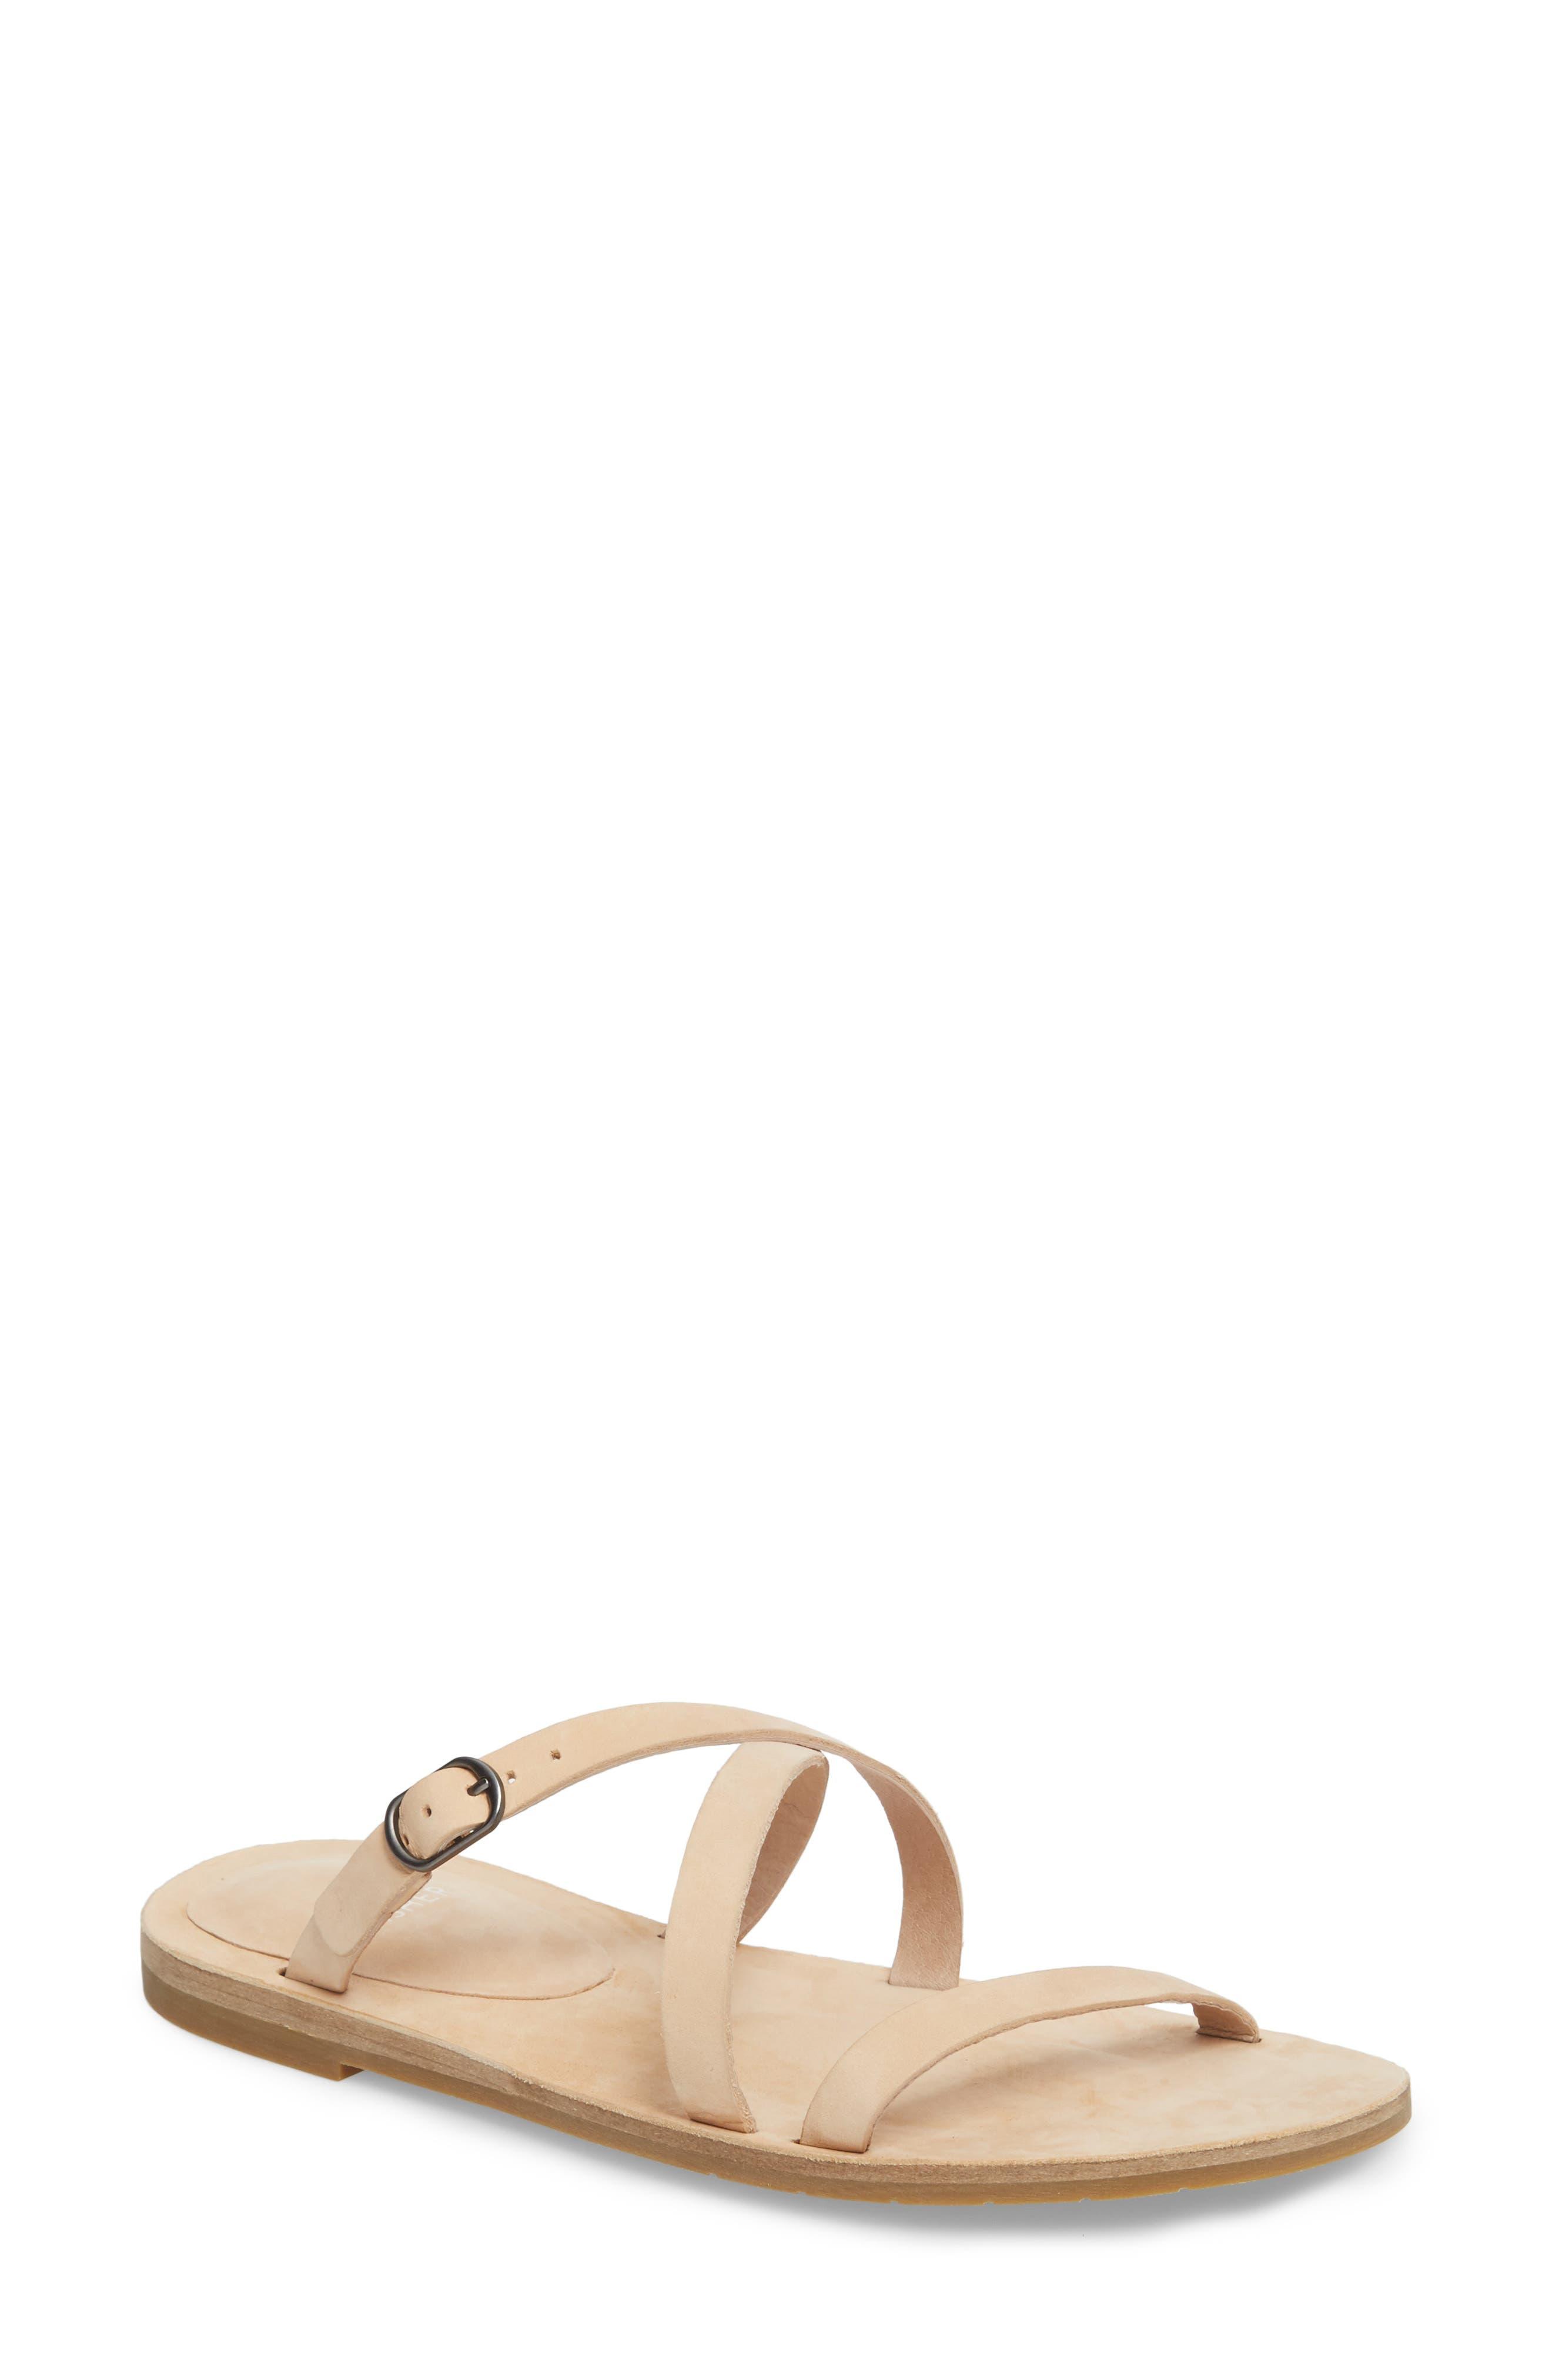 Dali Strappy Slide Sandal,                             Main thumbnail 1, color,                             Cream Nubuck